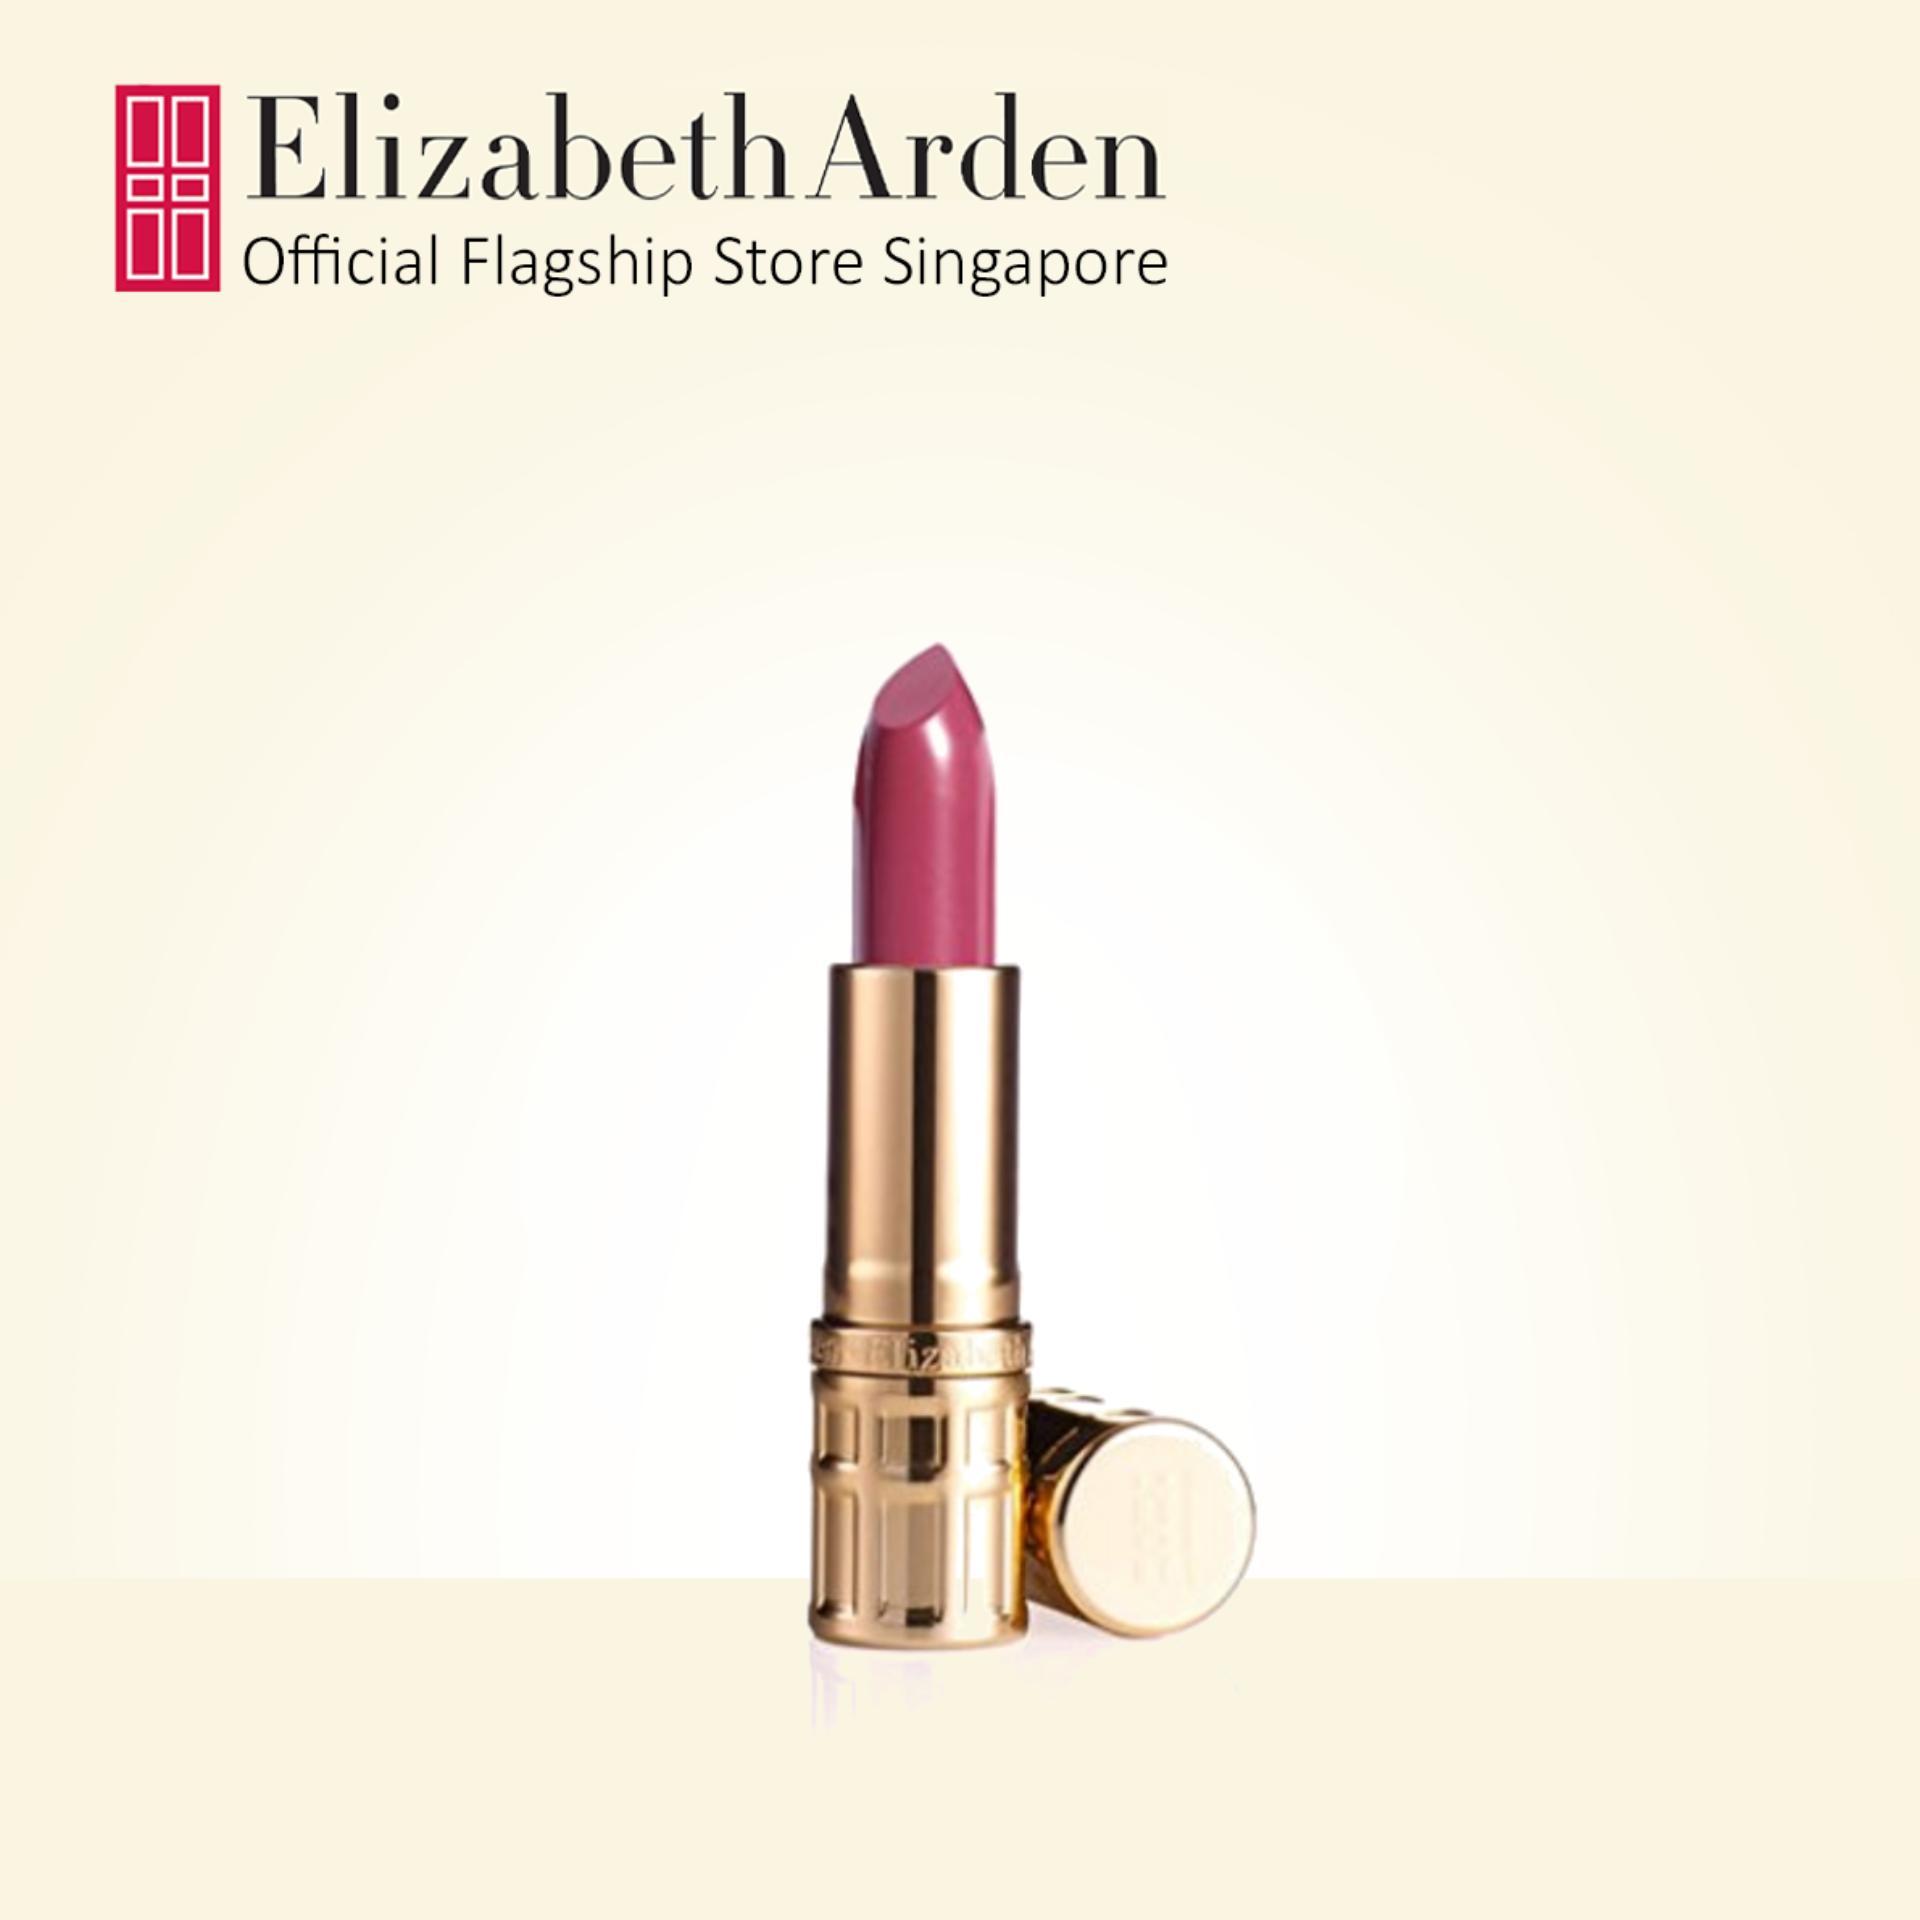 Elizabeth Arden Ceramide Ultra Lipstick 3.5g (shades Available) - (b) By Elizabeth Arden (capitaland Merchant).